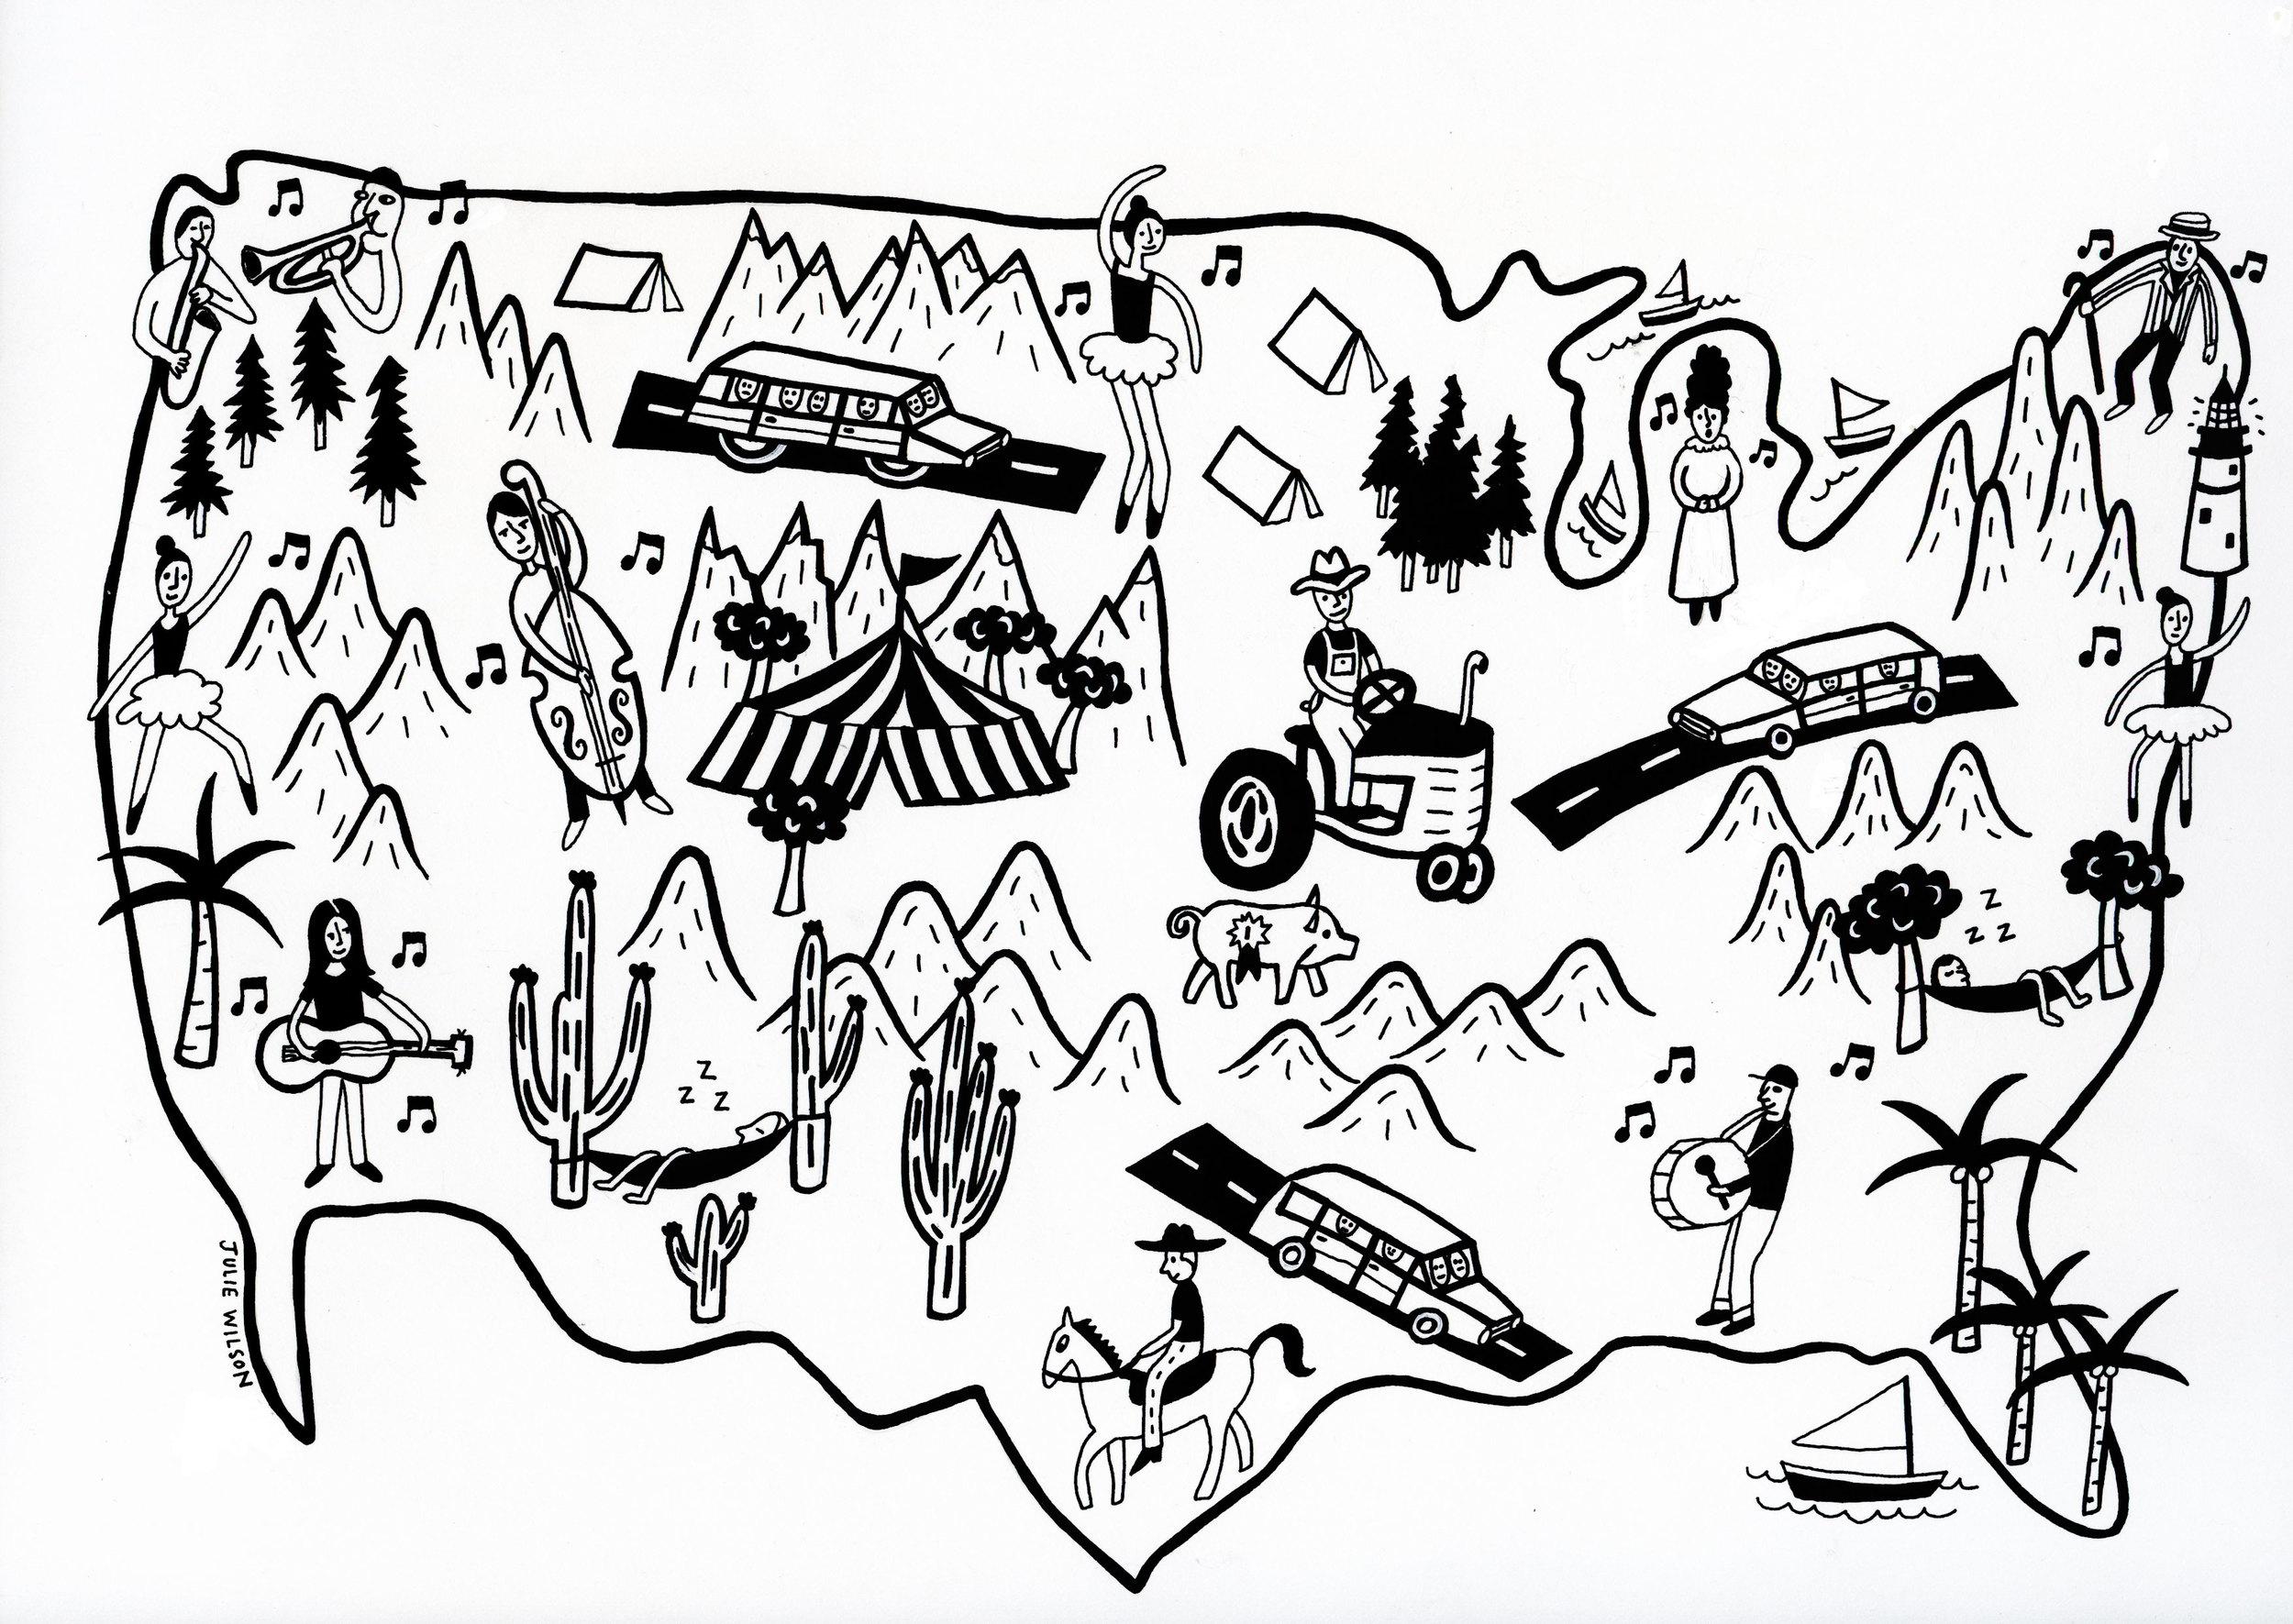 wsj-map-1987web.jpg